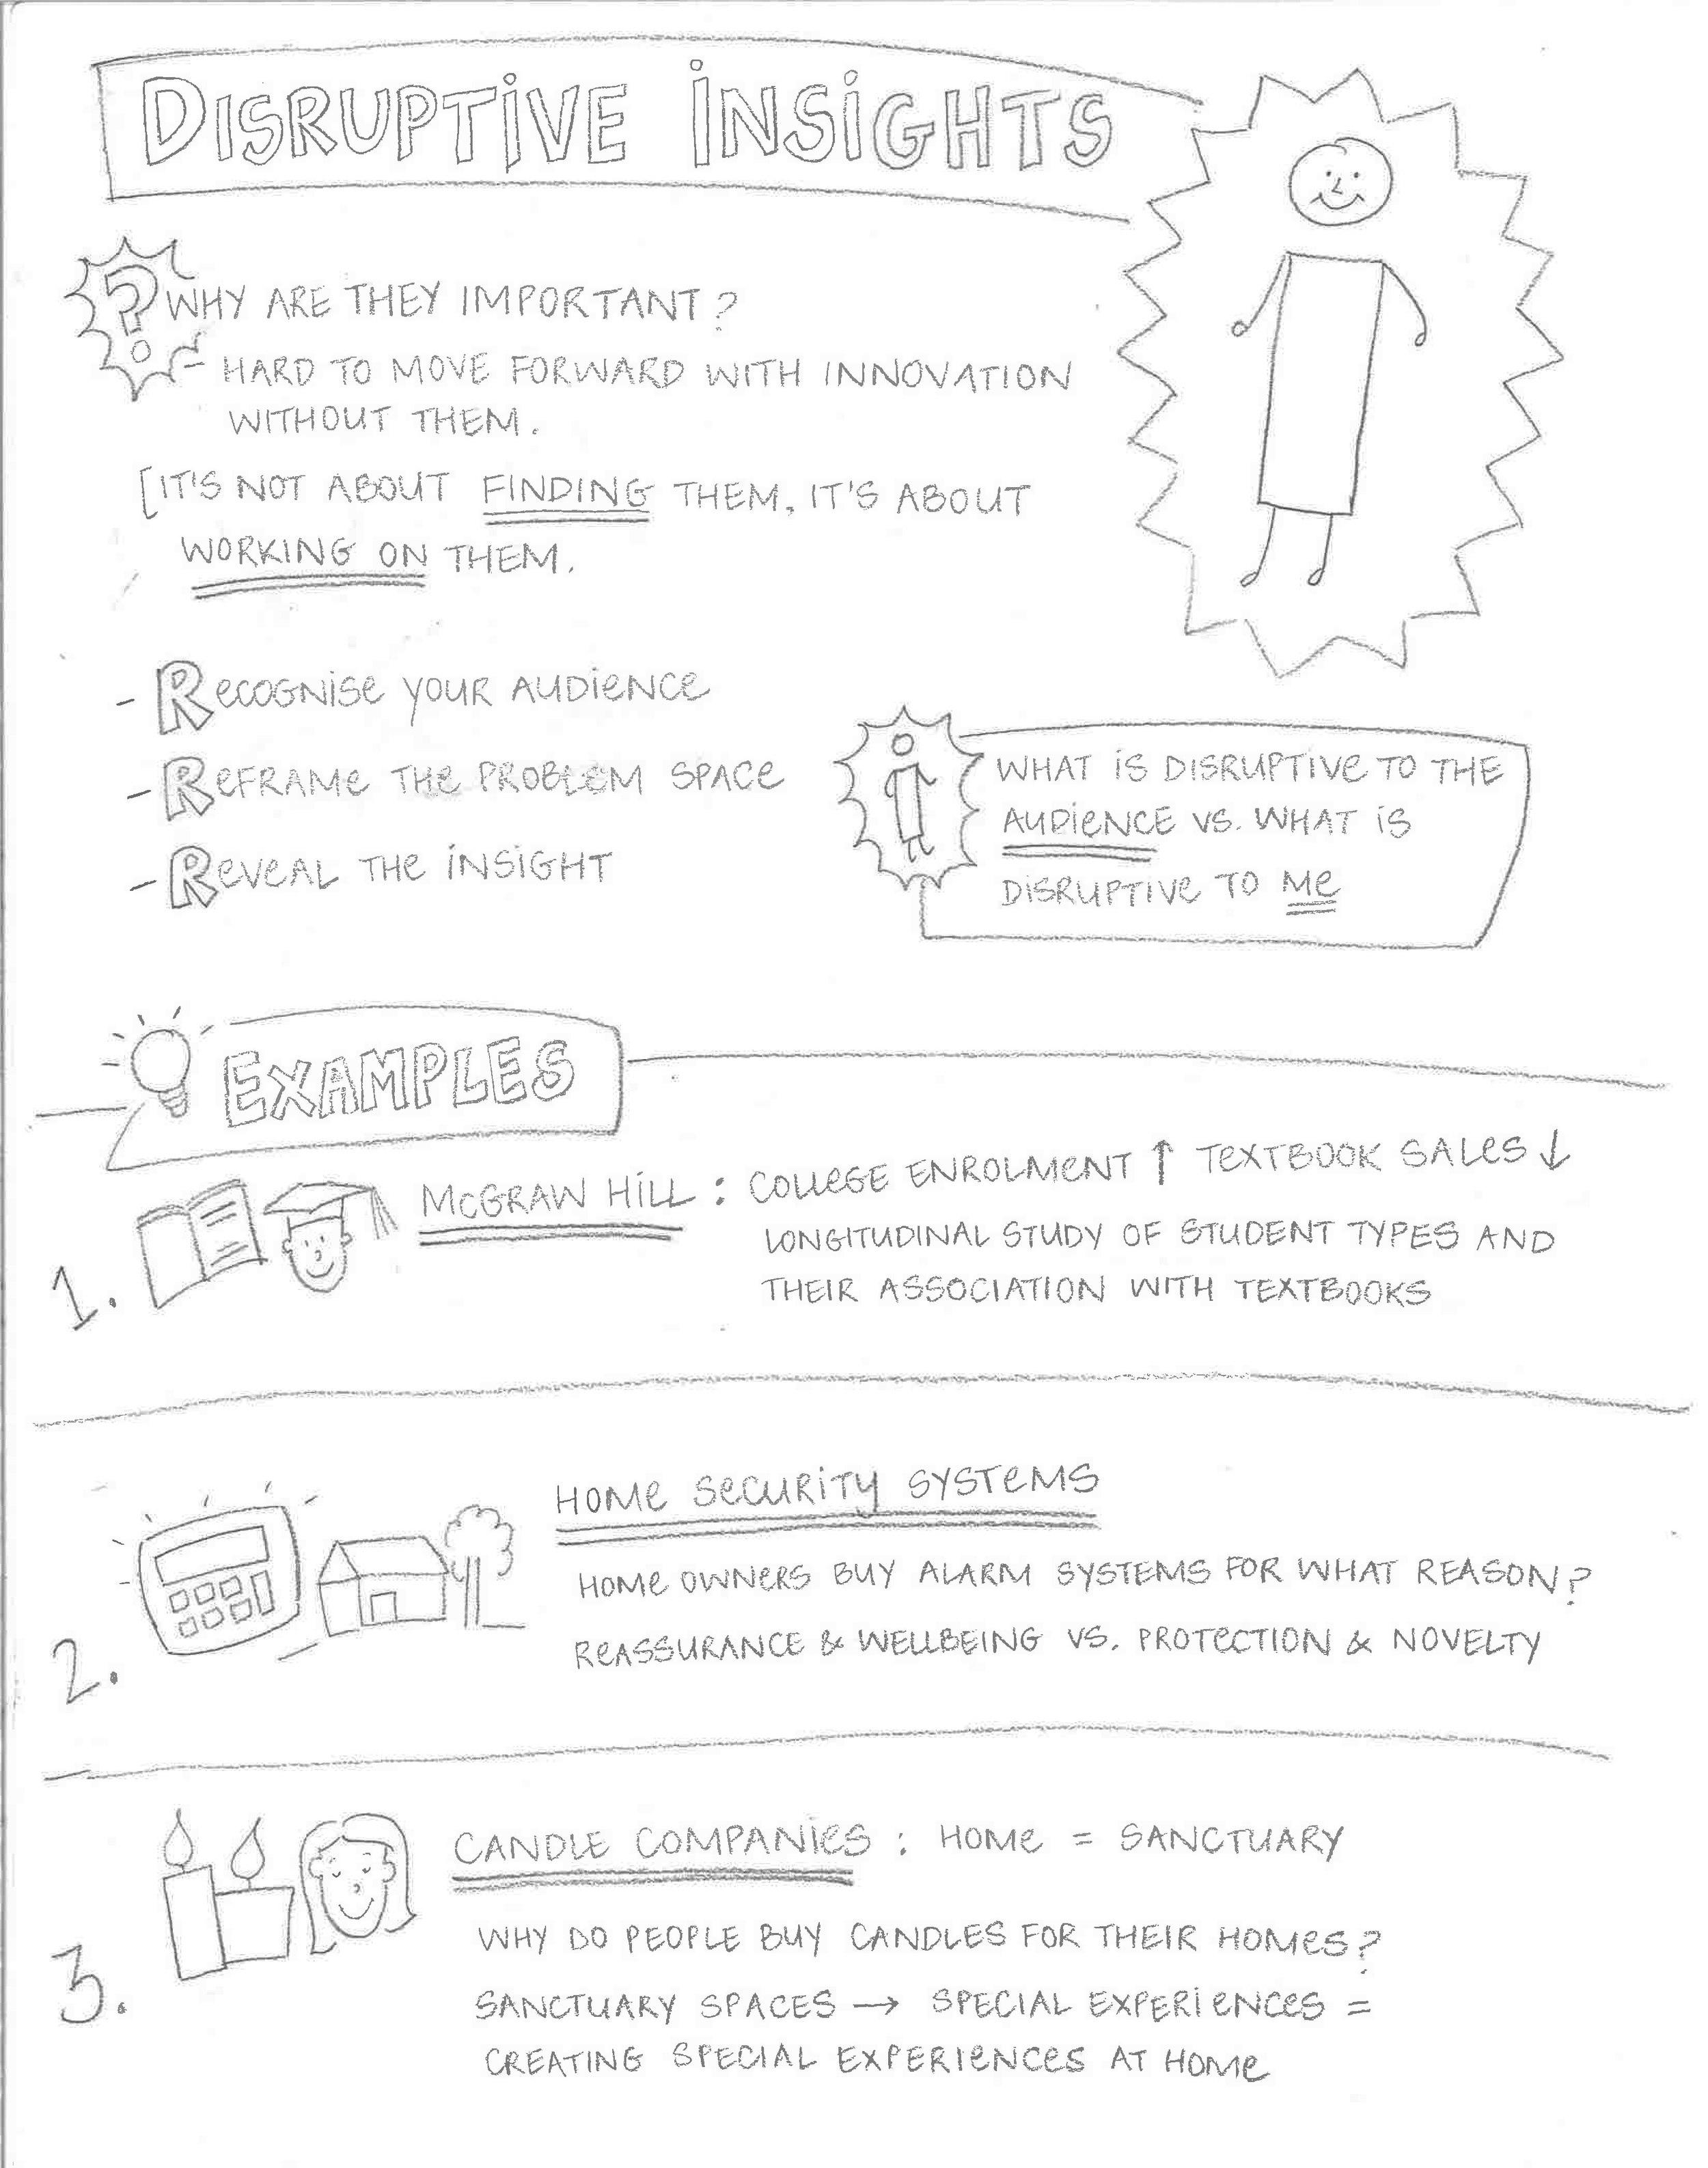 Rhea Rakshit - Disruptive Insights Toolkit_Page_1.jpg